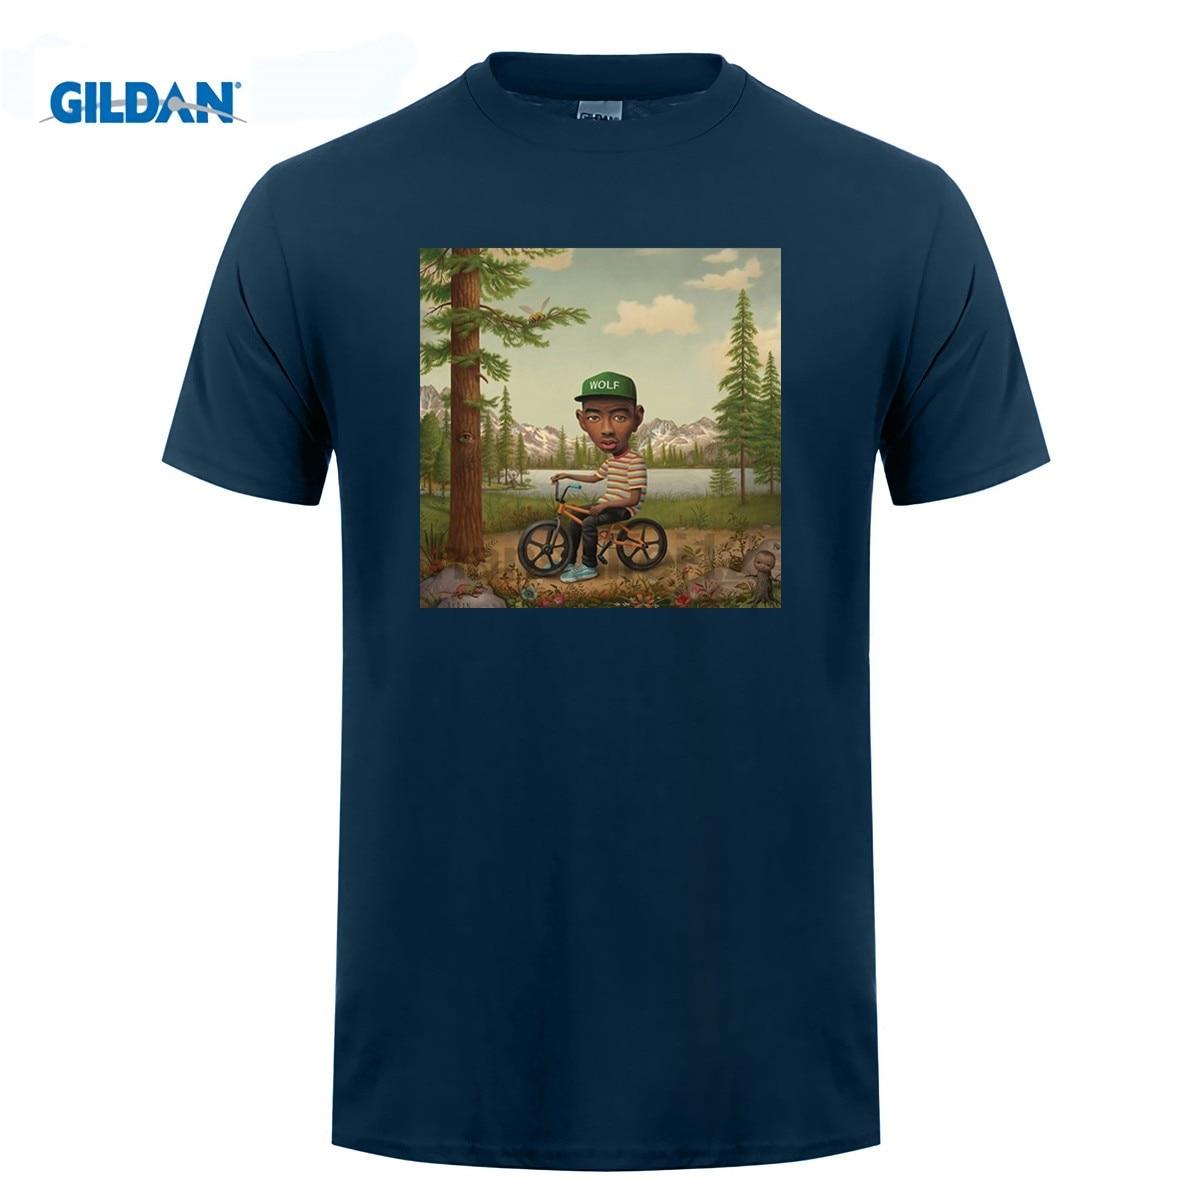 8ce868ac6f59 GILDAN Tyler The Creator Wolf T Shirt EARL Odd Future Wolf Gang HIP HOP  OFWGKTA OF New Summer-in T-Shirts from Men s Clothing on Aliexpress.com